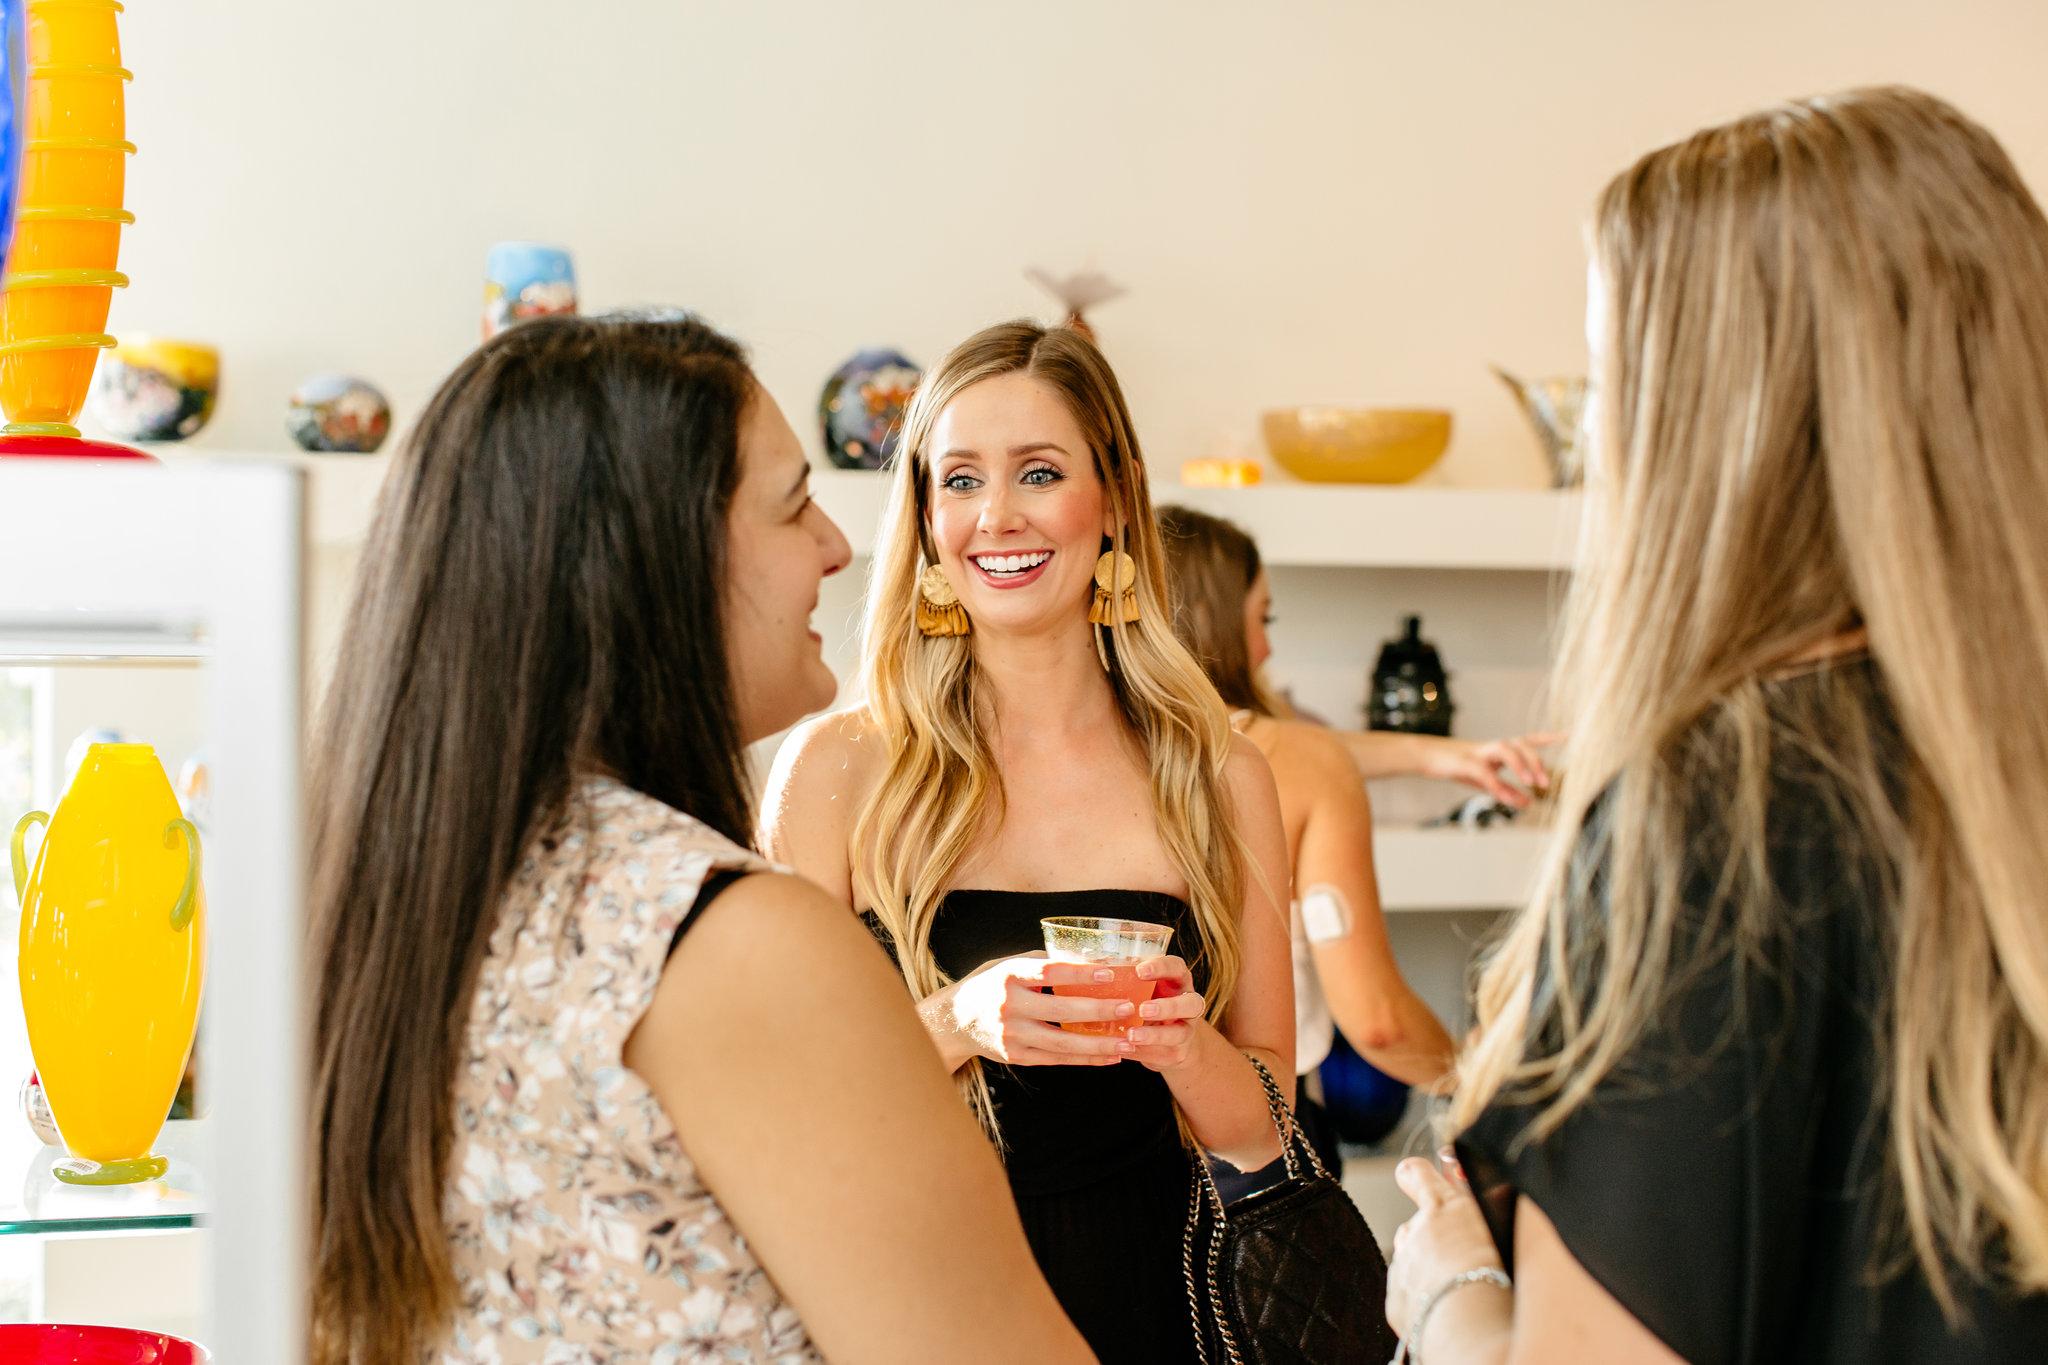 Alexa-Vossler-Photo_Dallas-Event-Photographer_Brite-Bar-Beauty-2018-Lipstick-Launch-Party-16.jpg